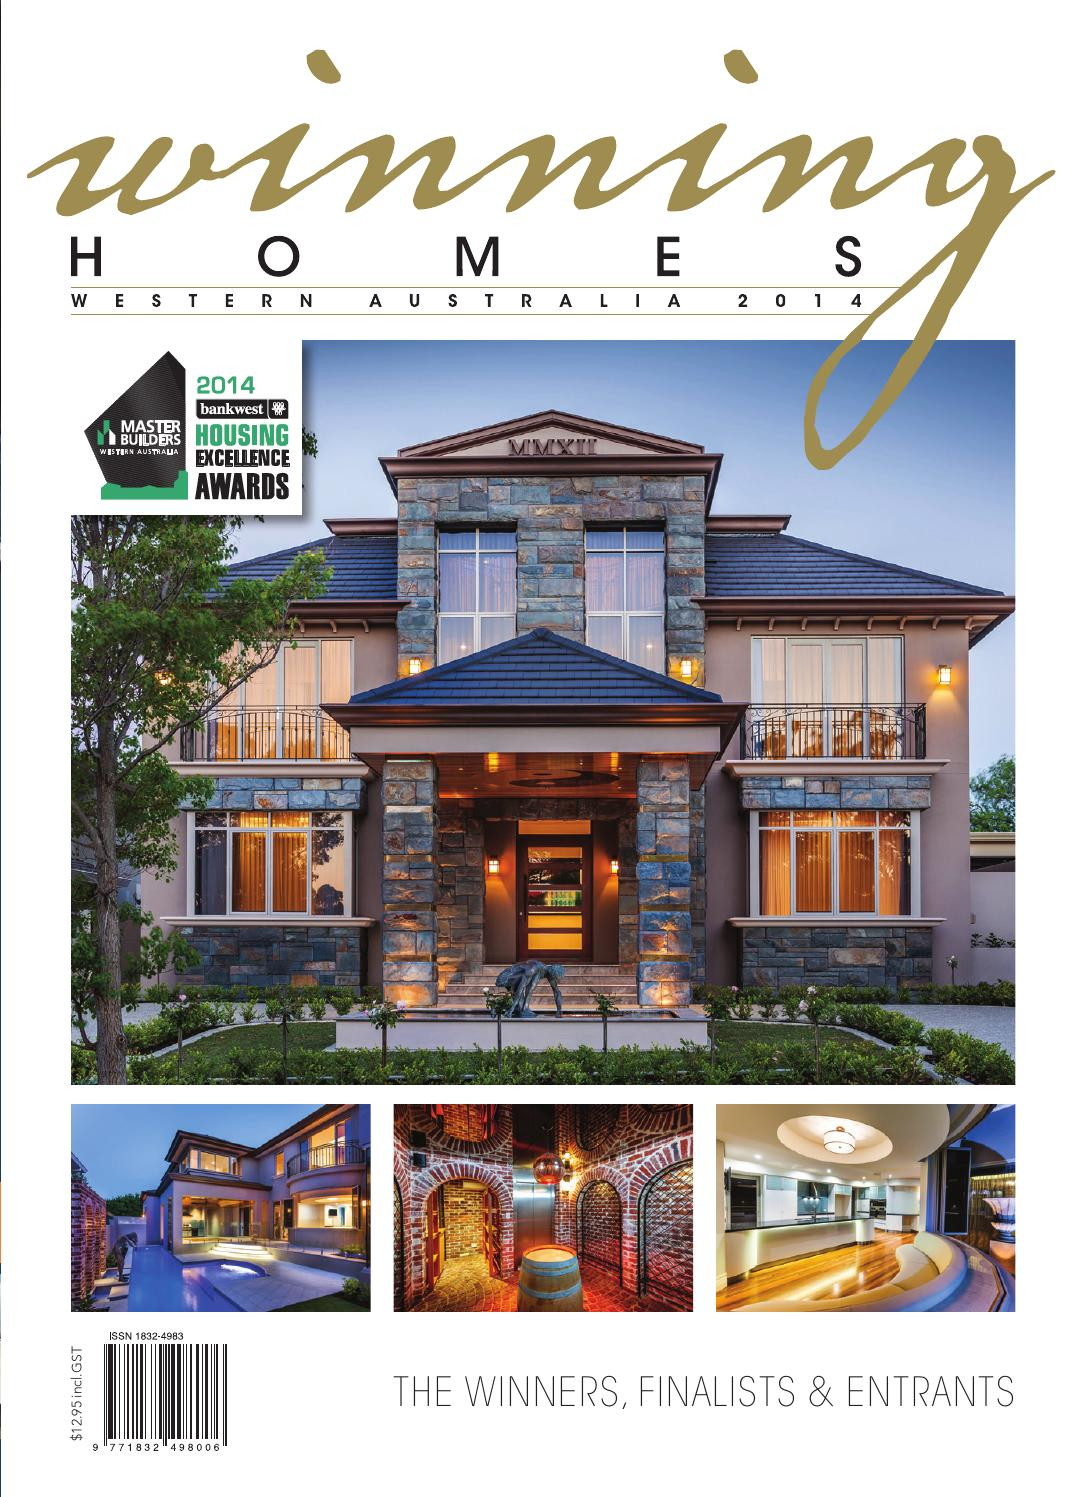 2014 Master Builders Western Australia Winning Homes